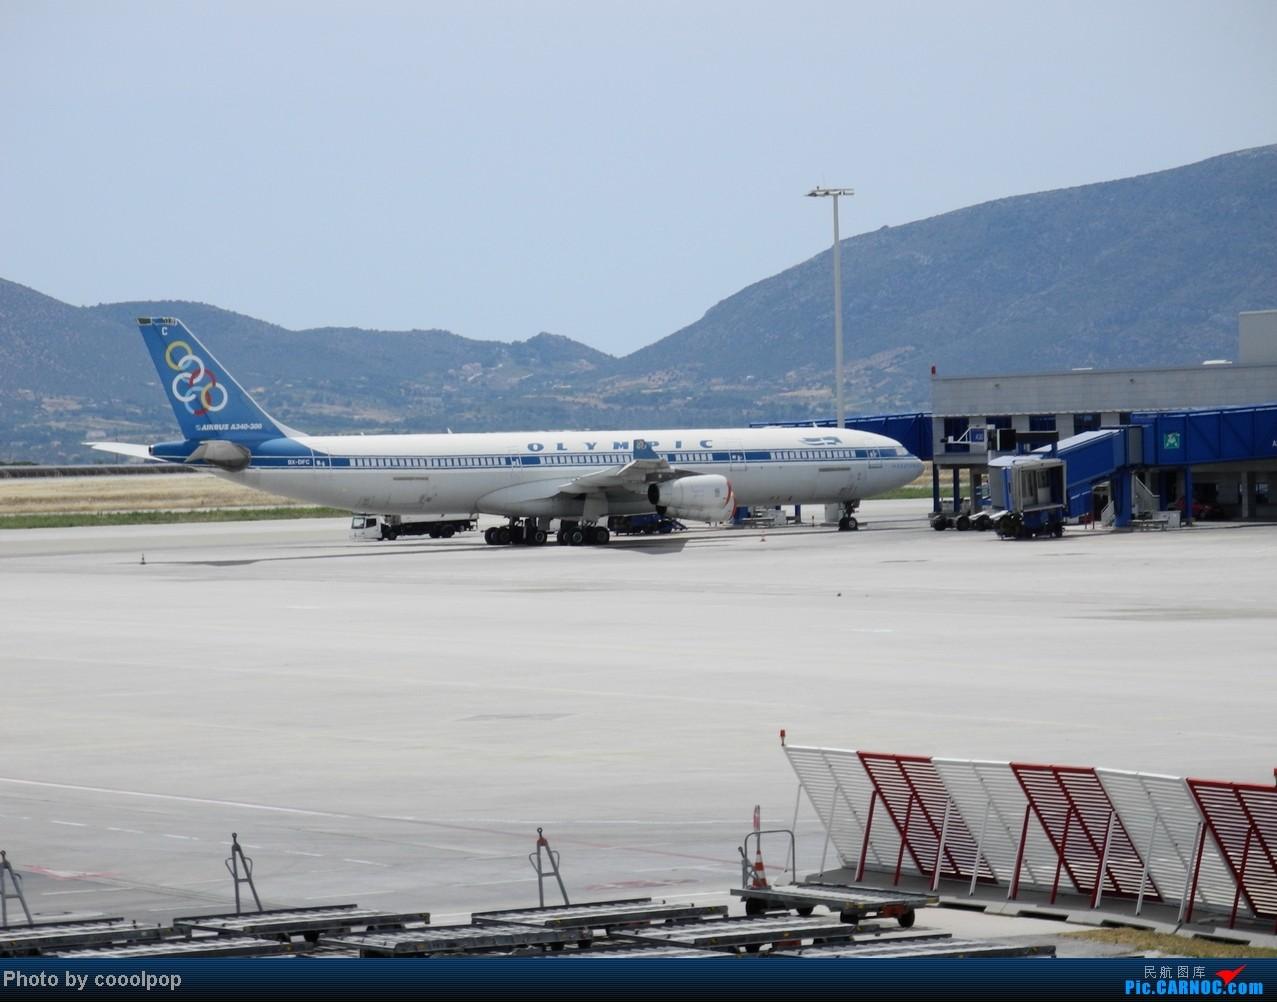 Re:[原创]一个人的 爱琴海 ! A340-300 SX-DFC 希腊雅典机场